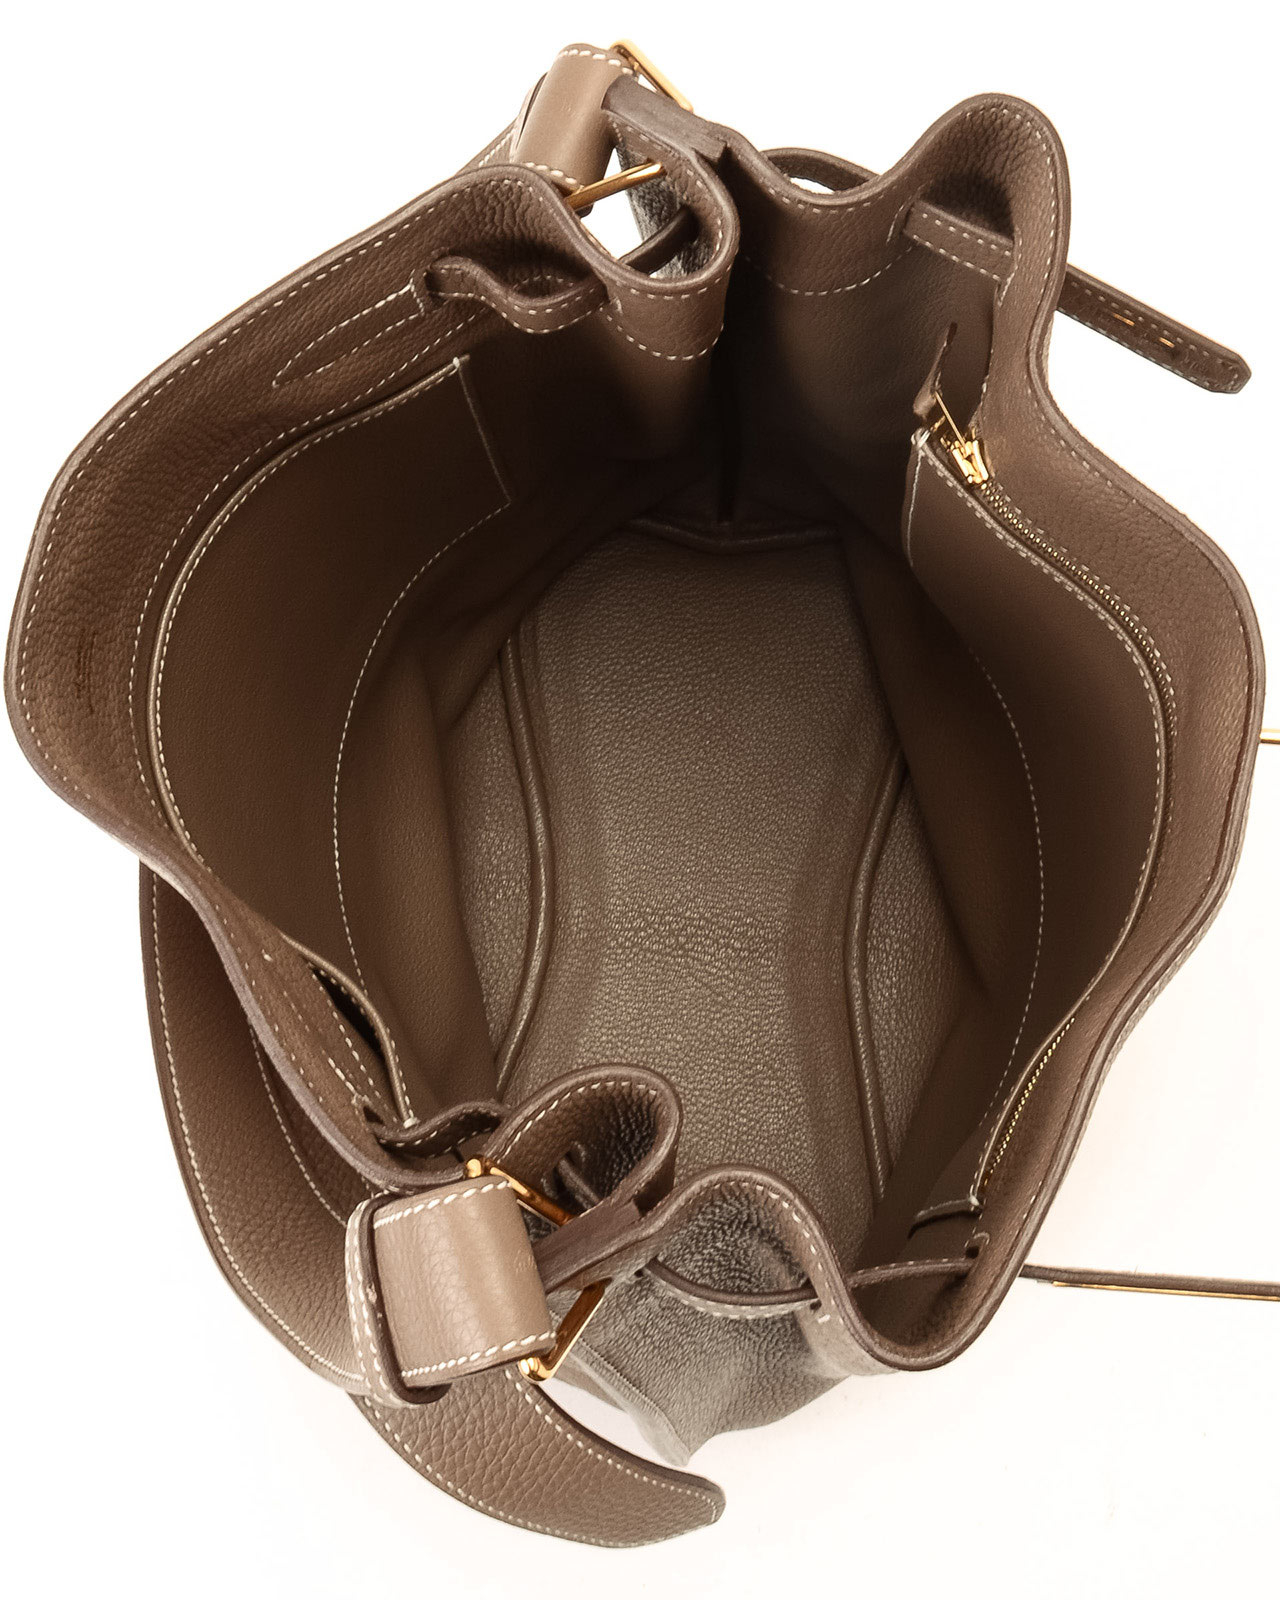 classic hermes kelly bag